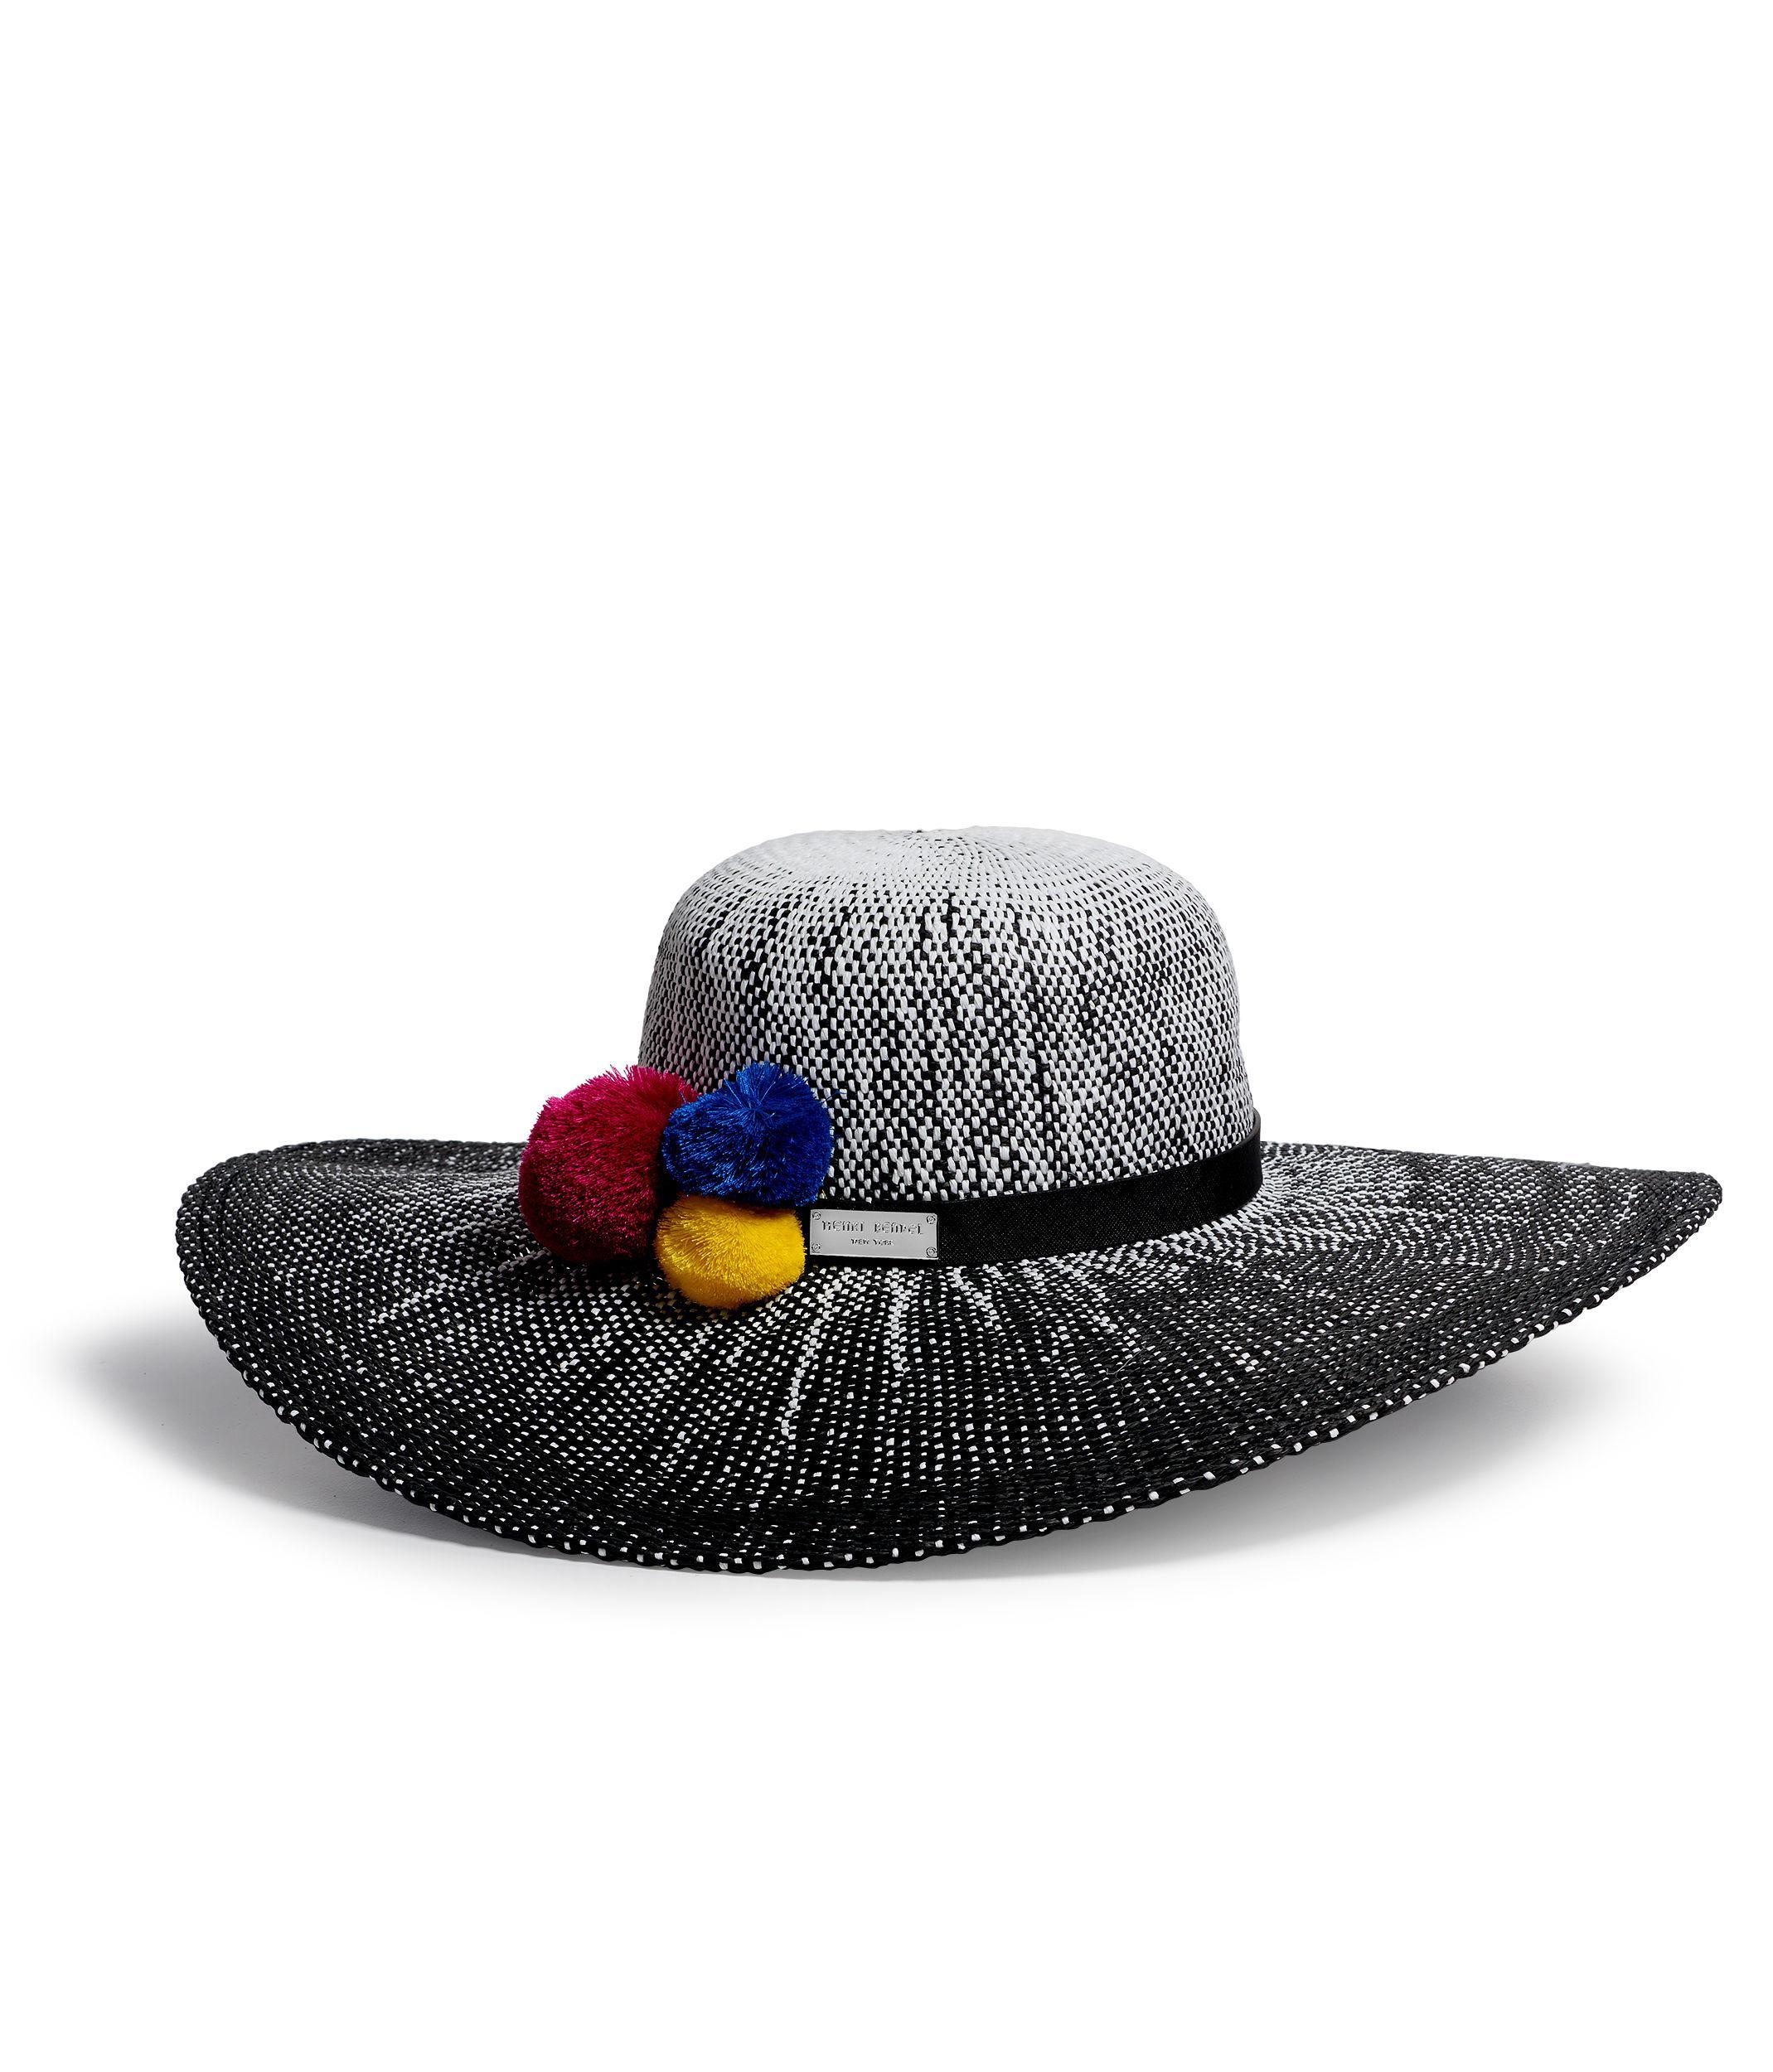 Lyst - Henri Bendel Lima Straw Hat in Black cd2224c4636